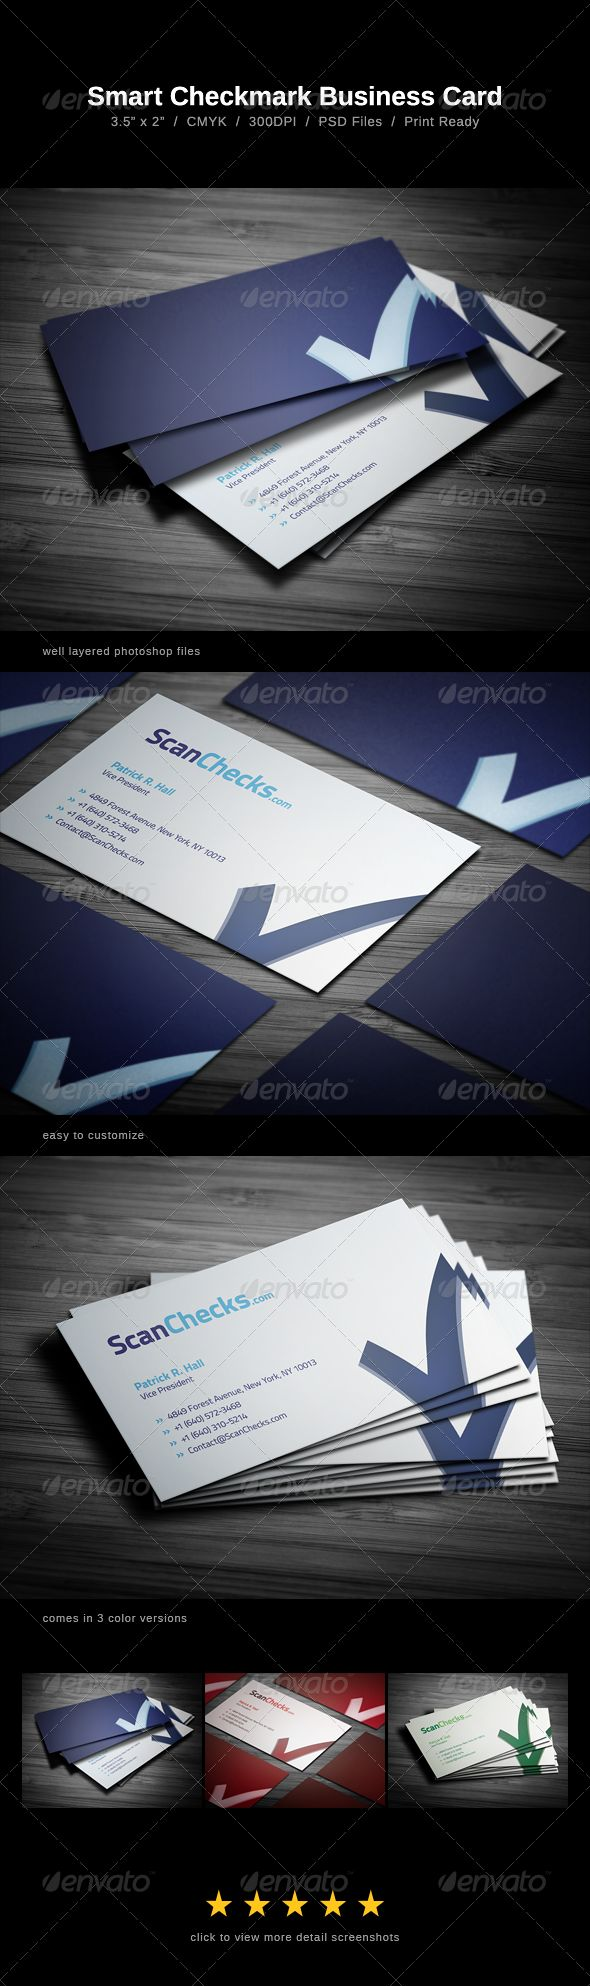 68 best Business Card Design images on Pinterest   Business cards ...